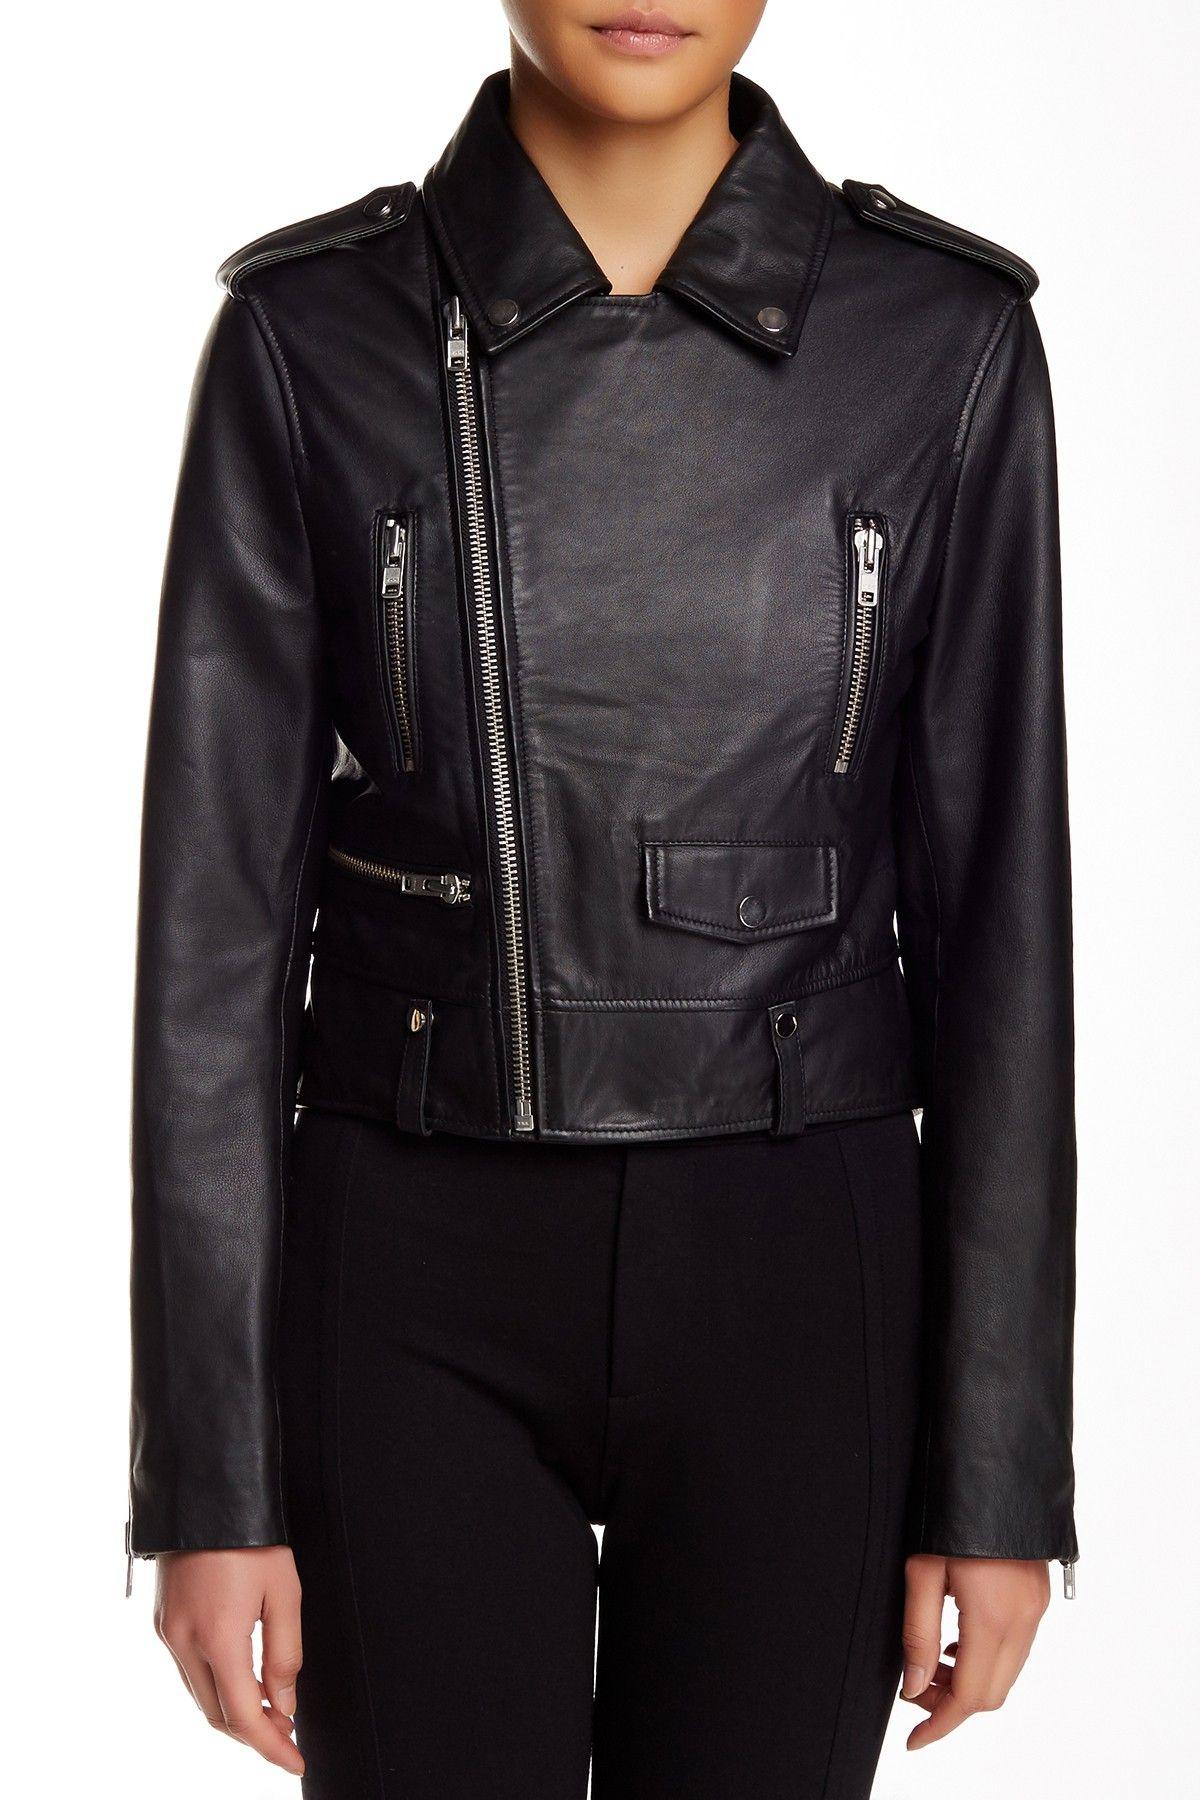 W118 by Walter Baker Hannah Lamb Leather Jacket